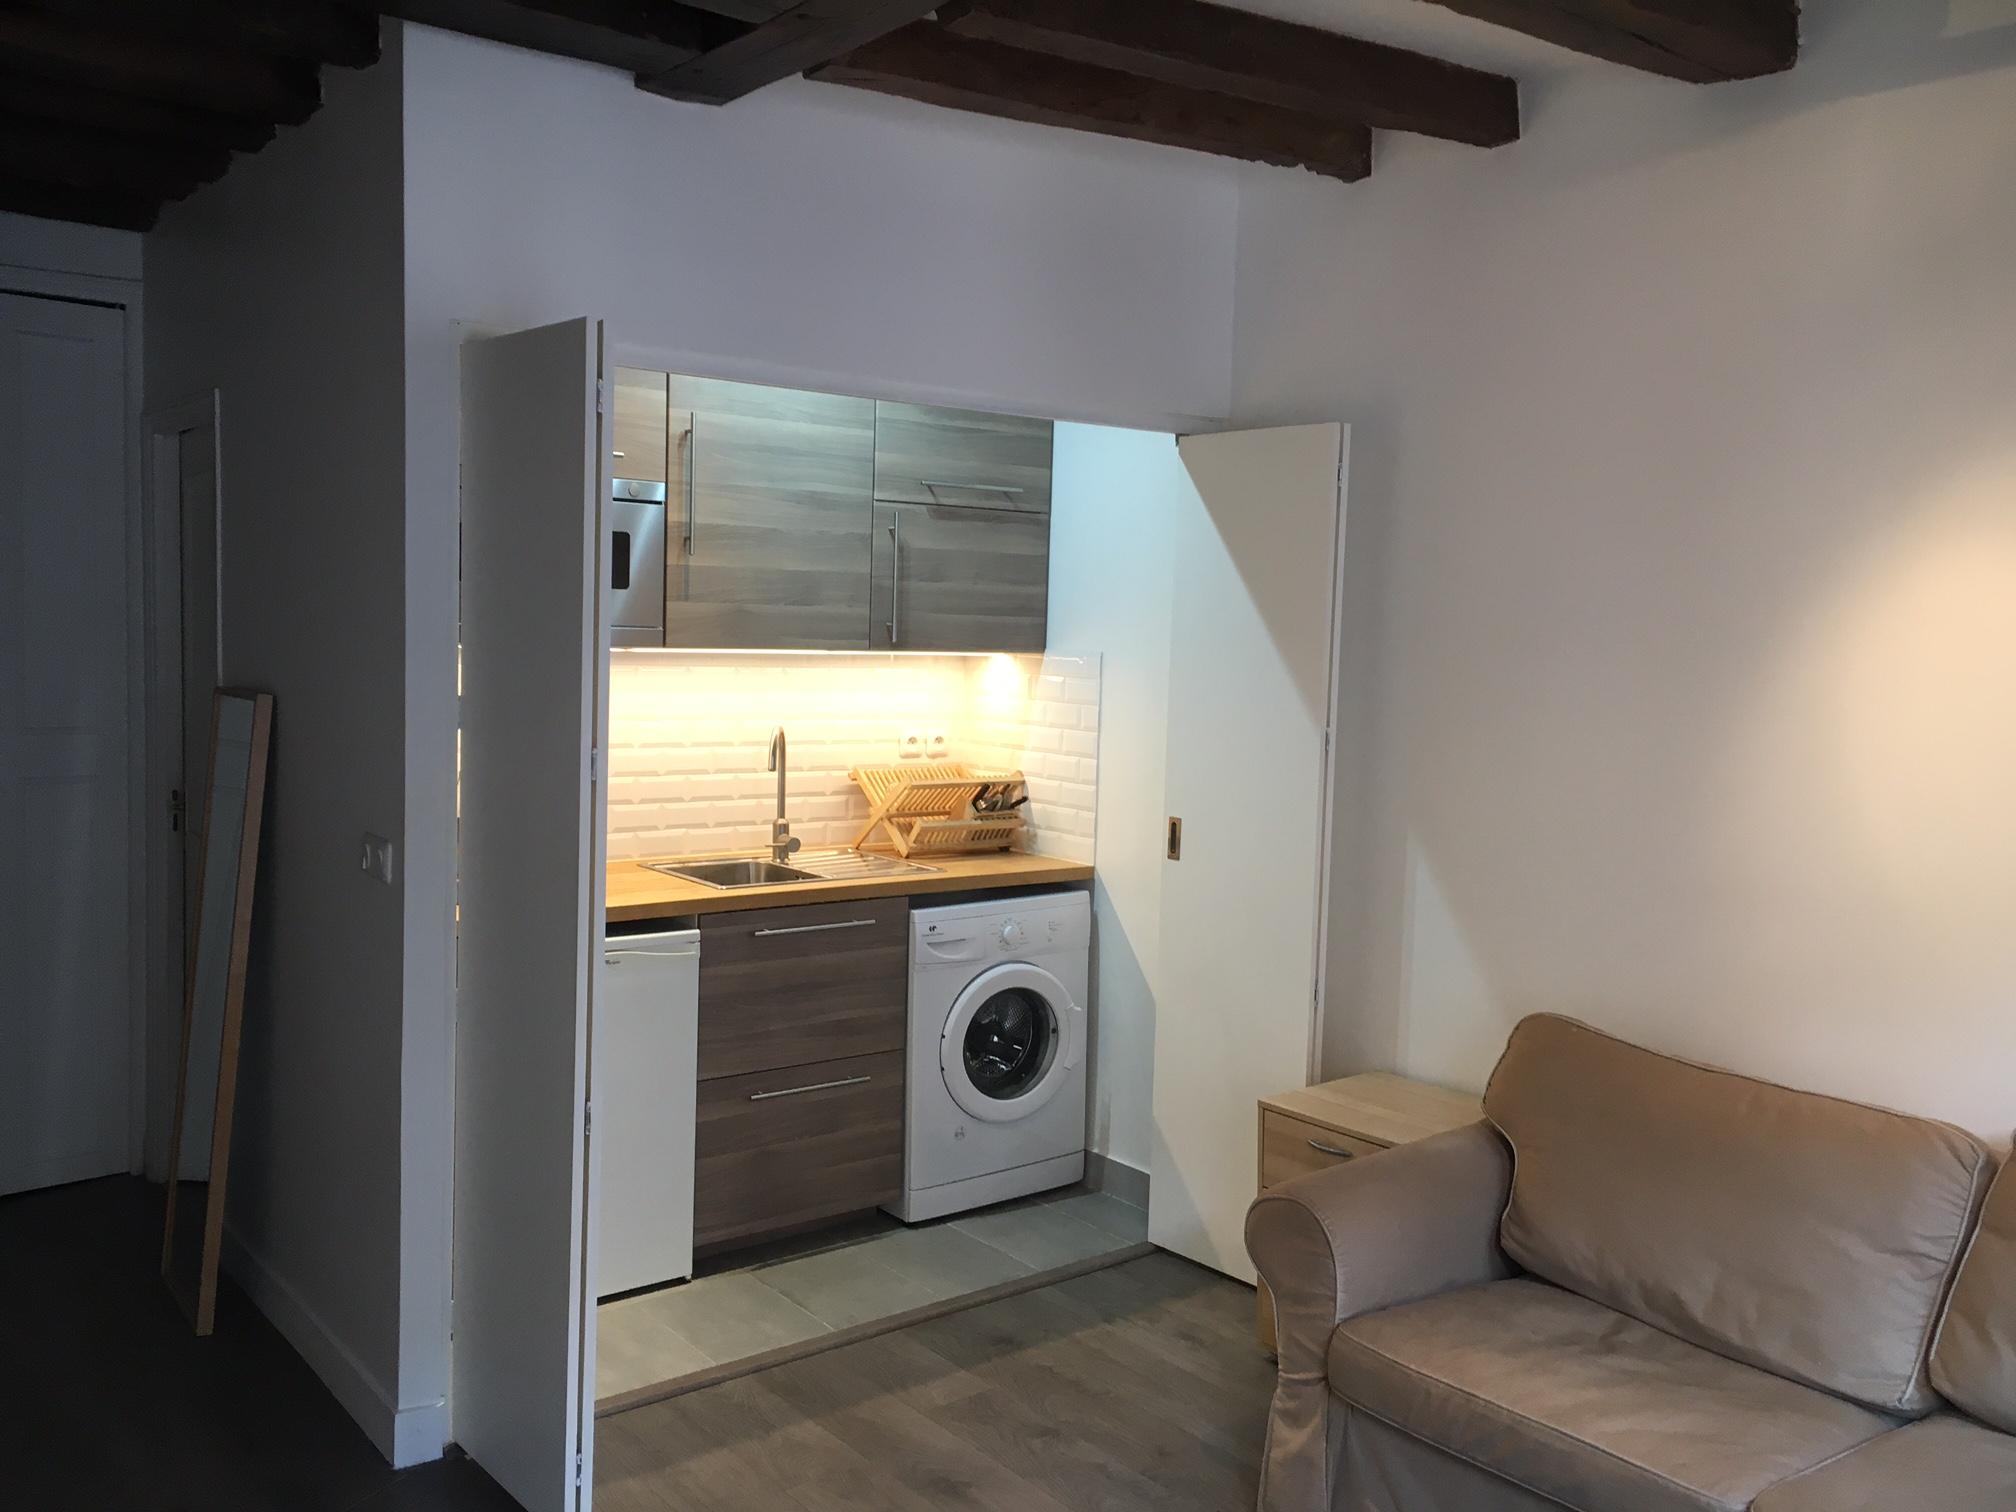 valiere-cortez-location-studio-mouffetard-cuisine